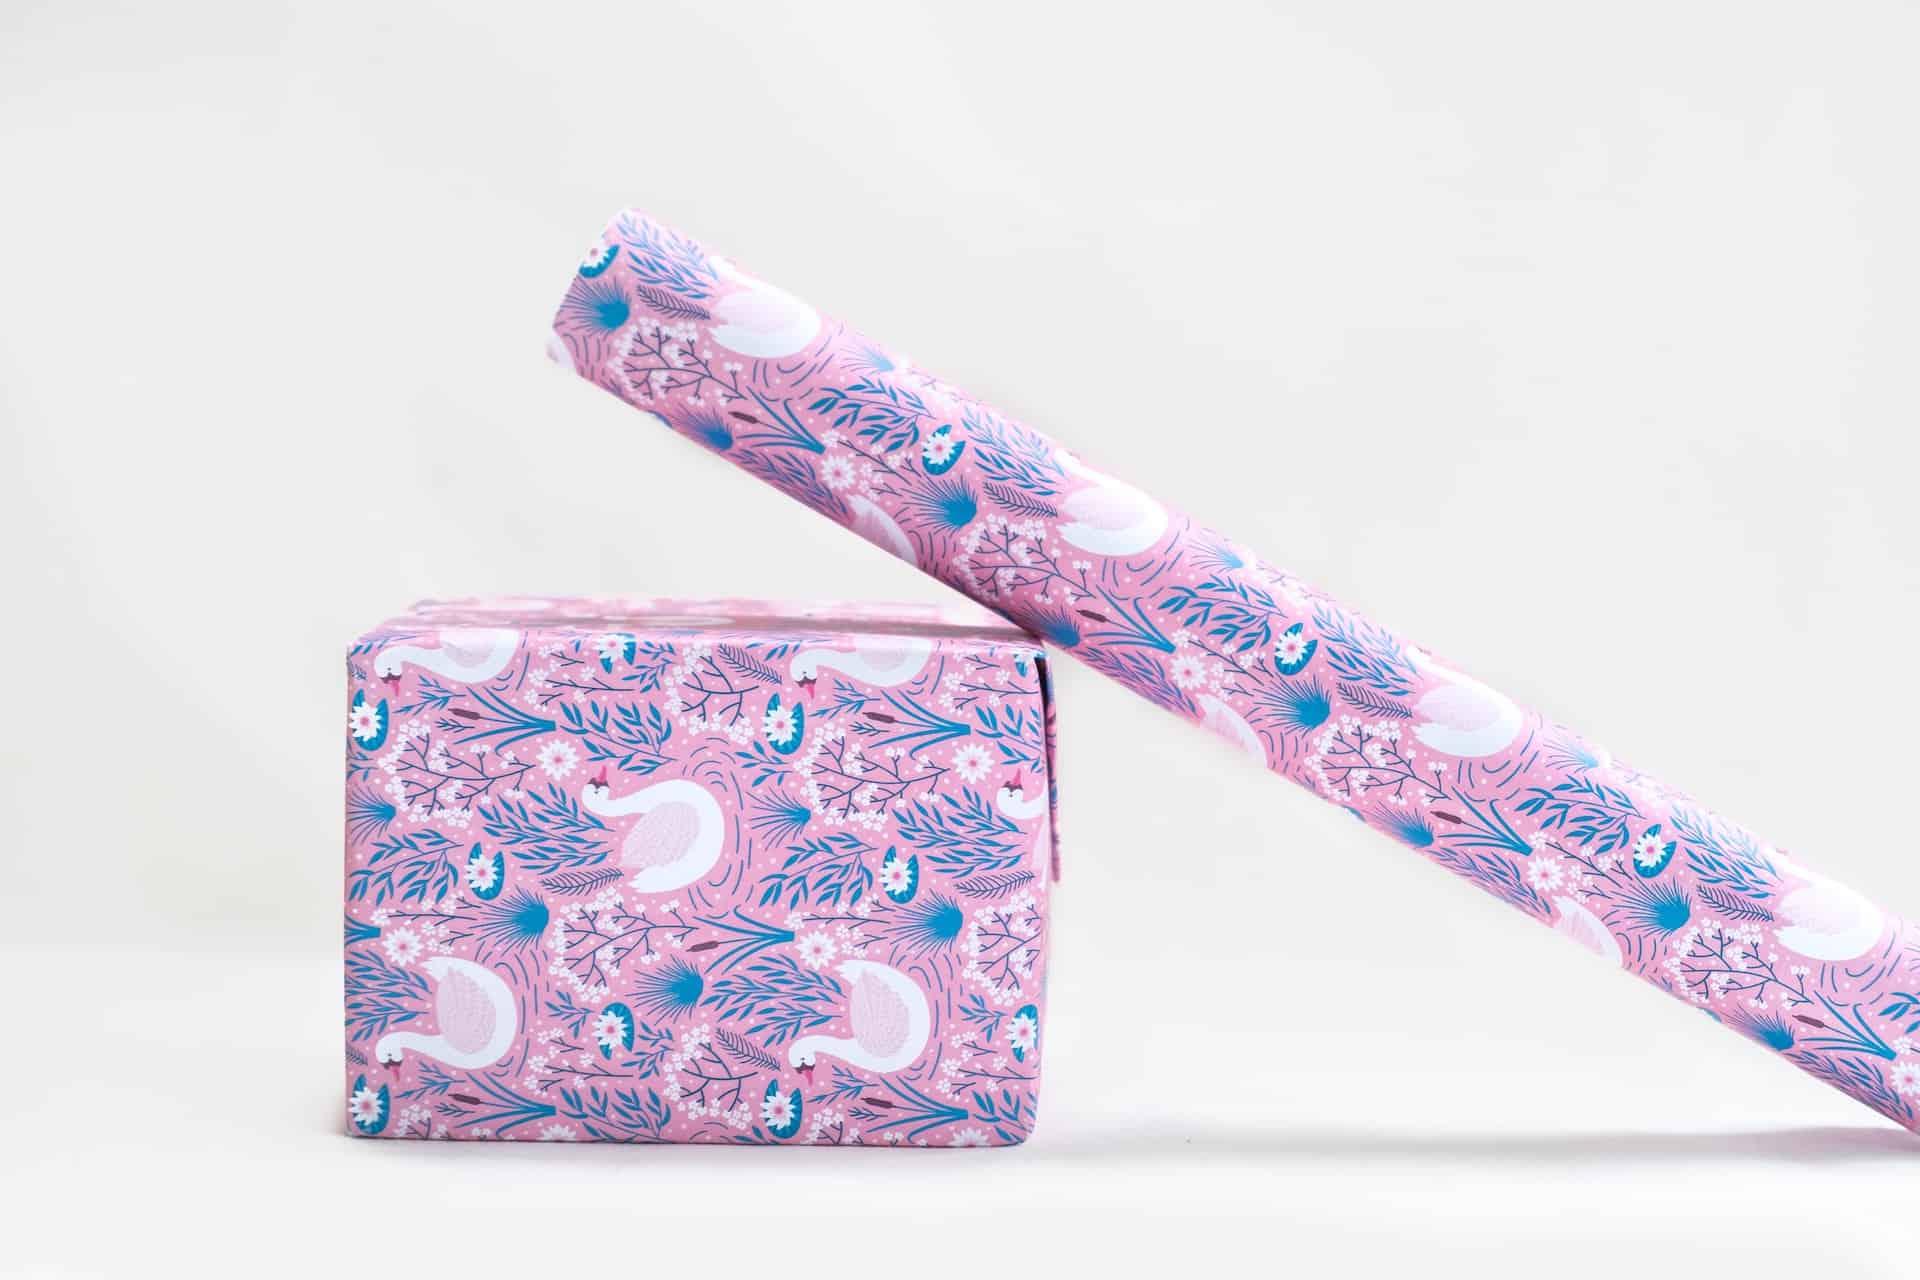 Pinkes Geschenkpapier